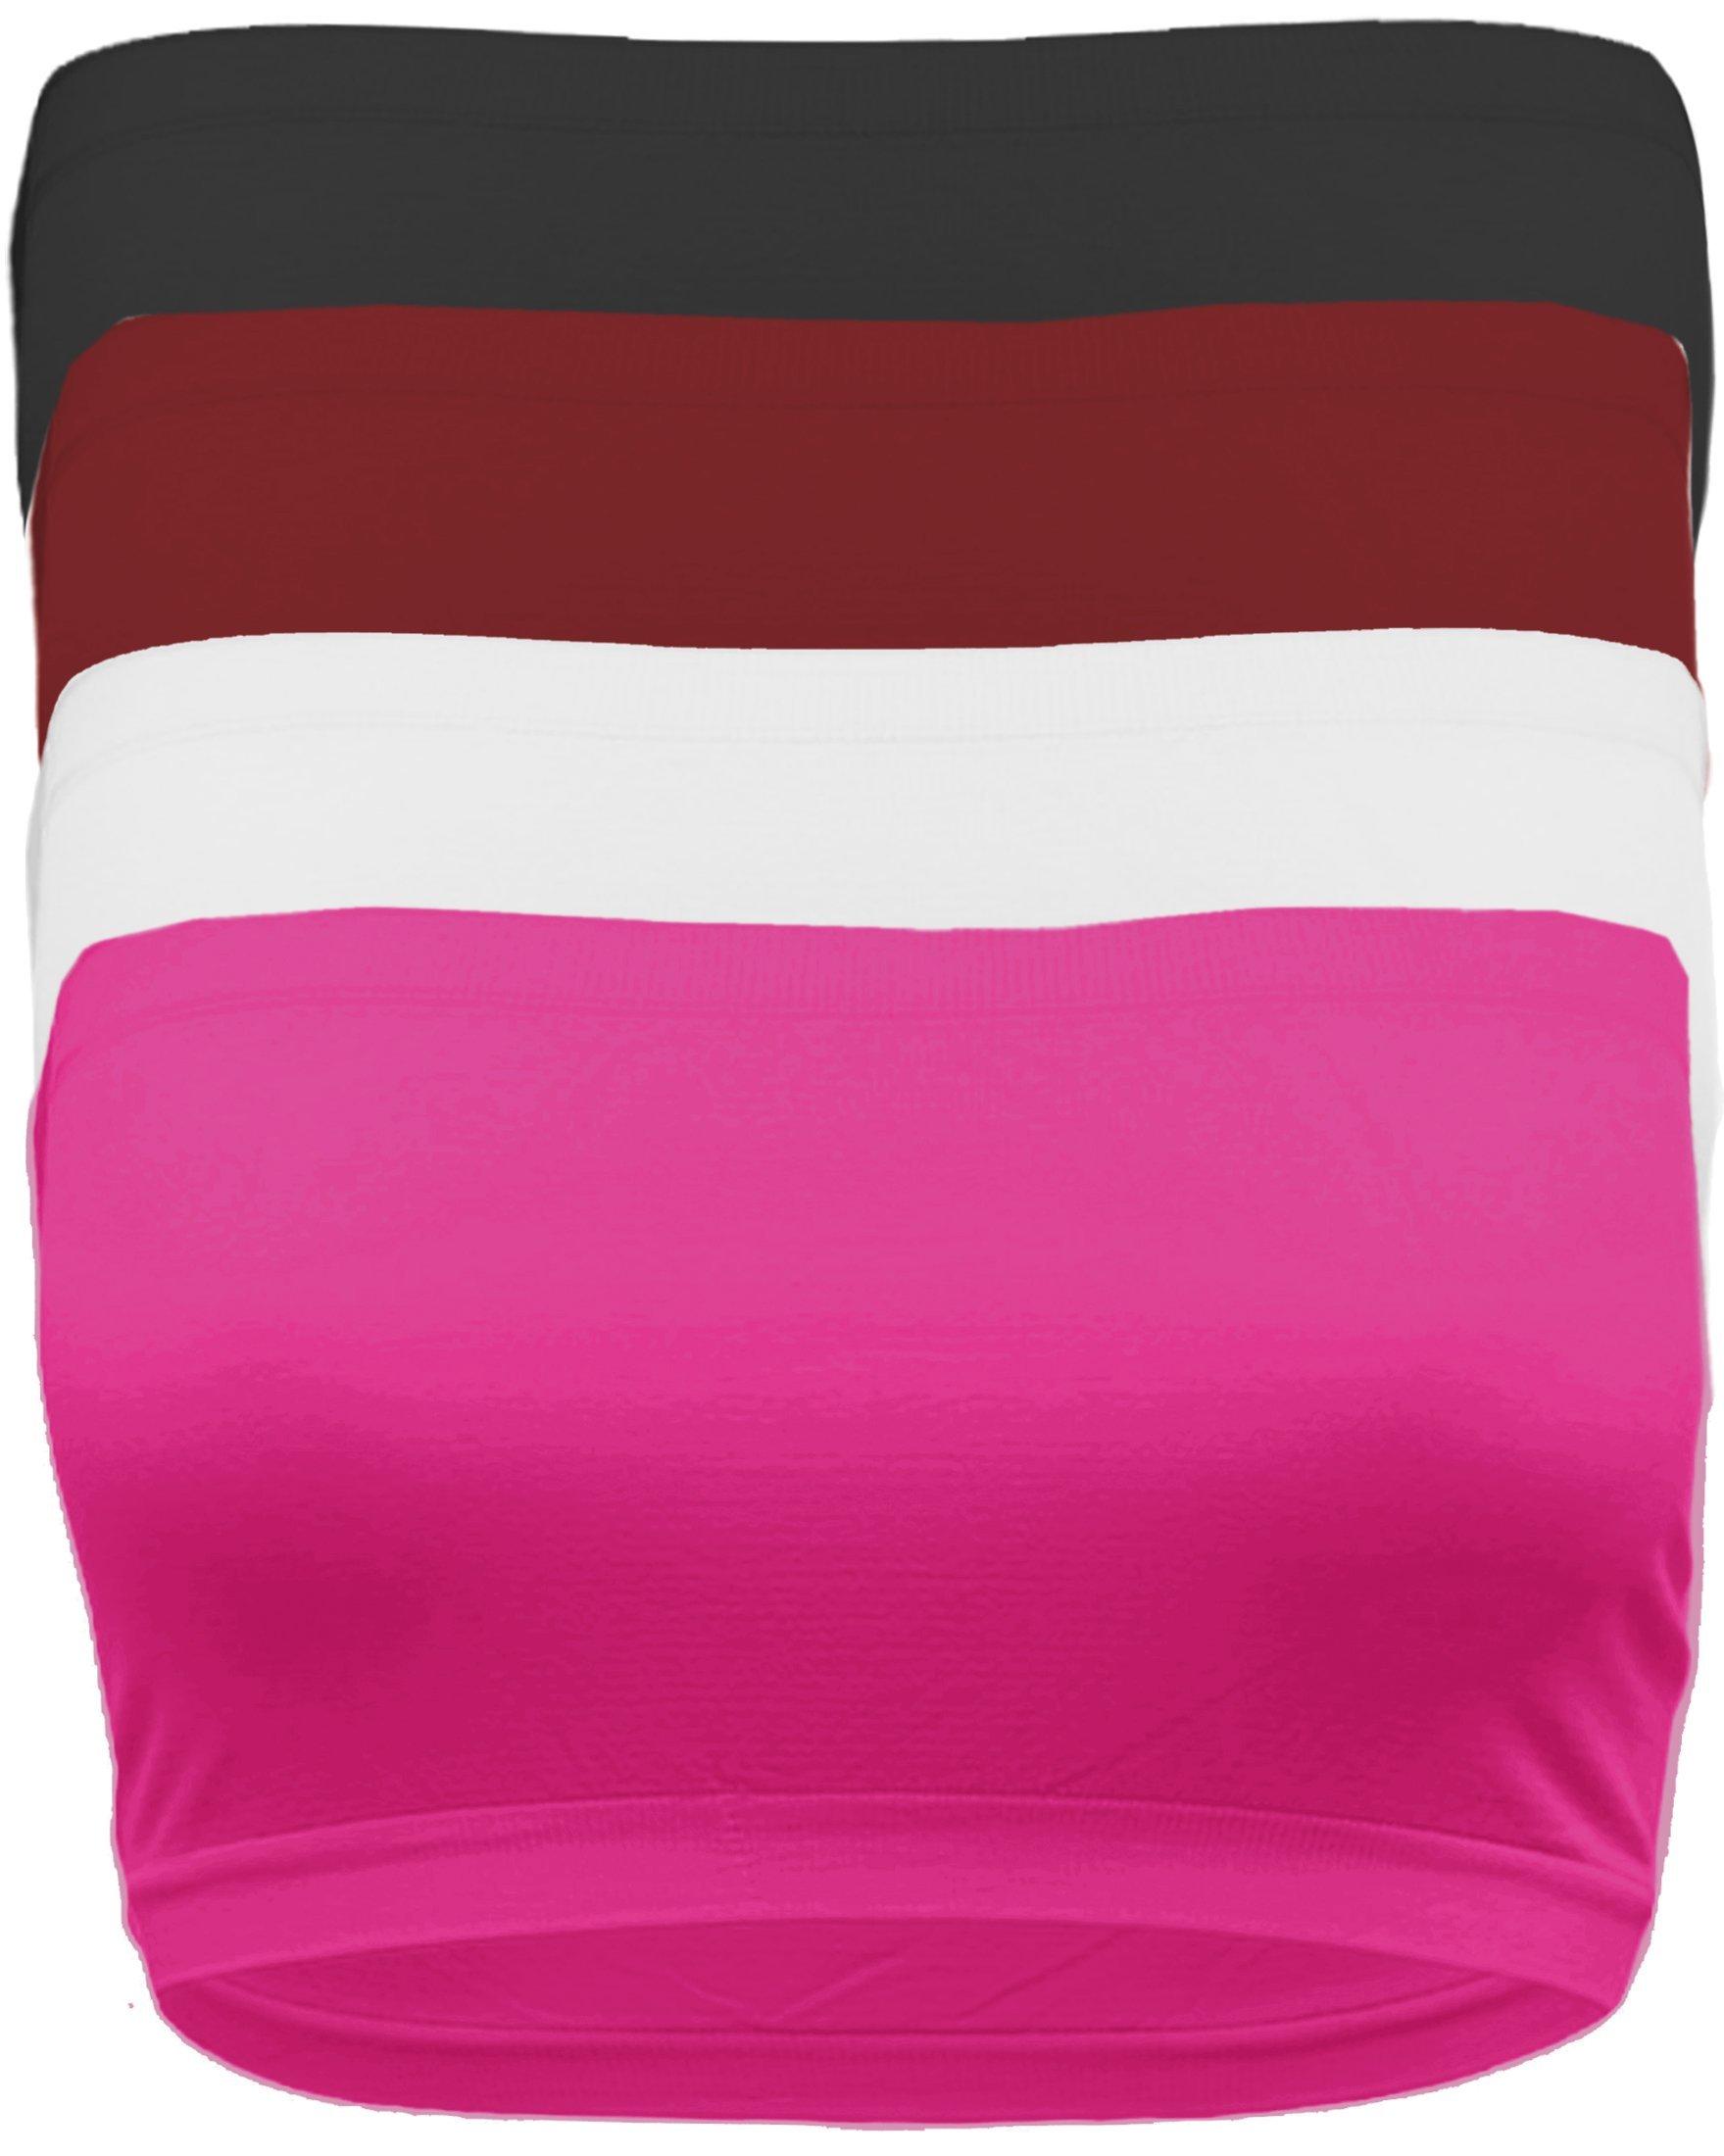 Ollie Arnes Curvy Women's Plus Size Non Padded Stretchy Soft Tube Top Bandeu Bra PLUSSIZE BK_WH_Fuch_Burg-Plus